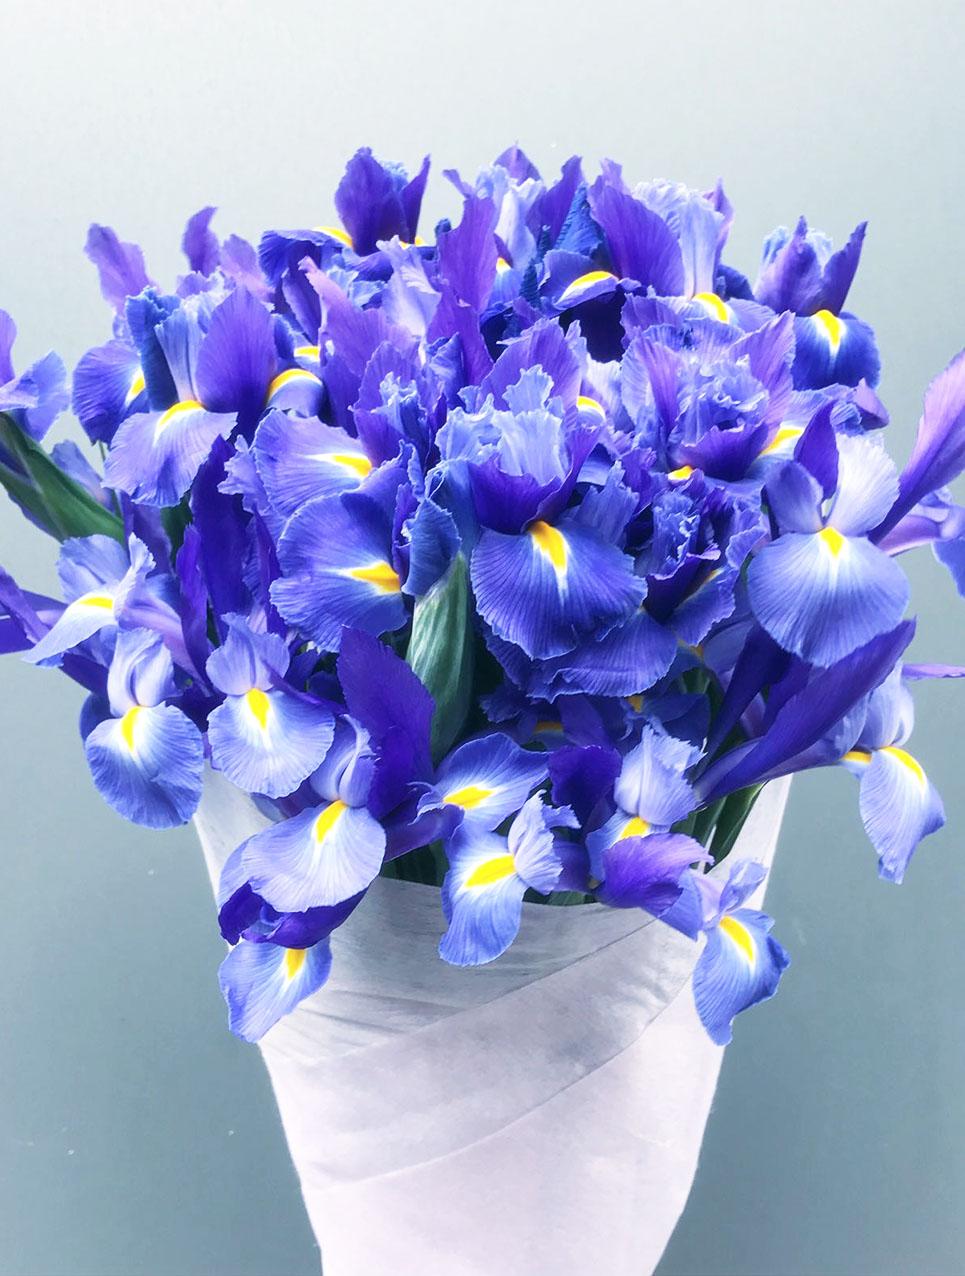 Different Floral Arrangements for Office